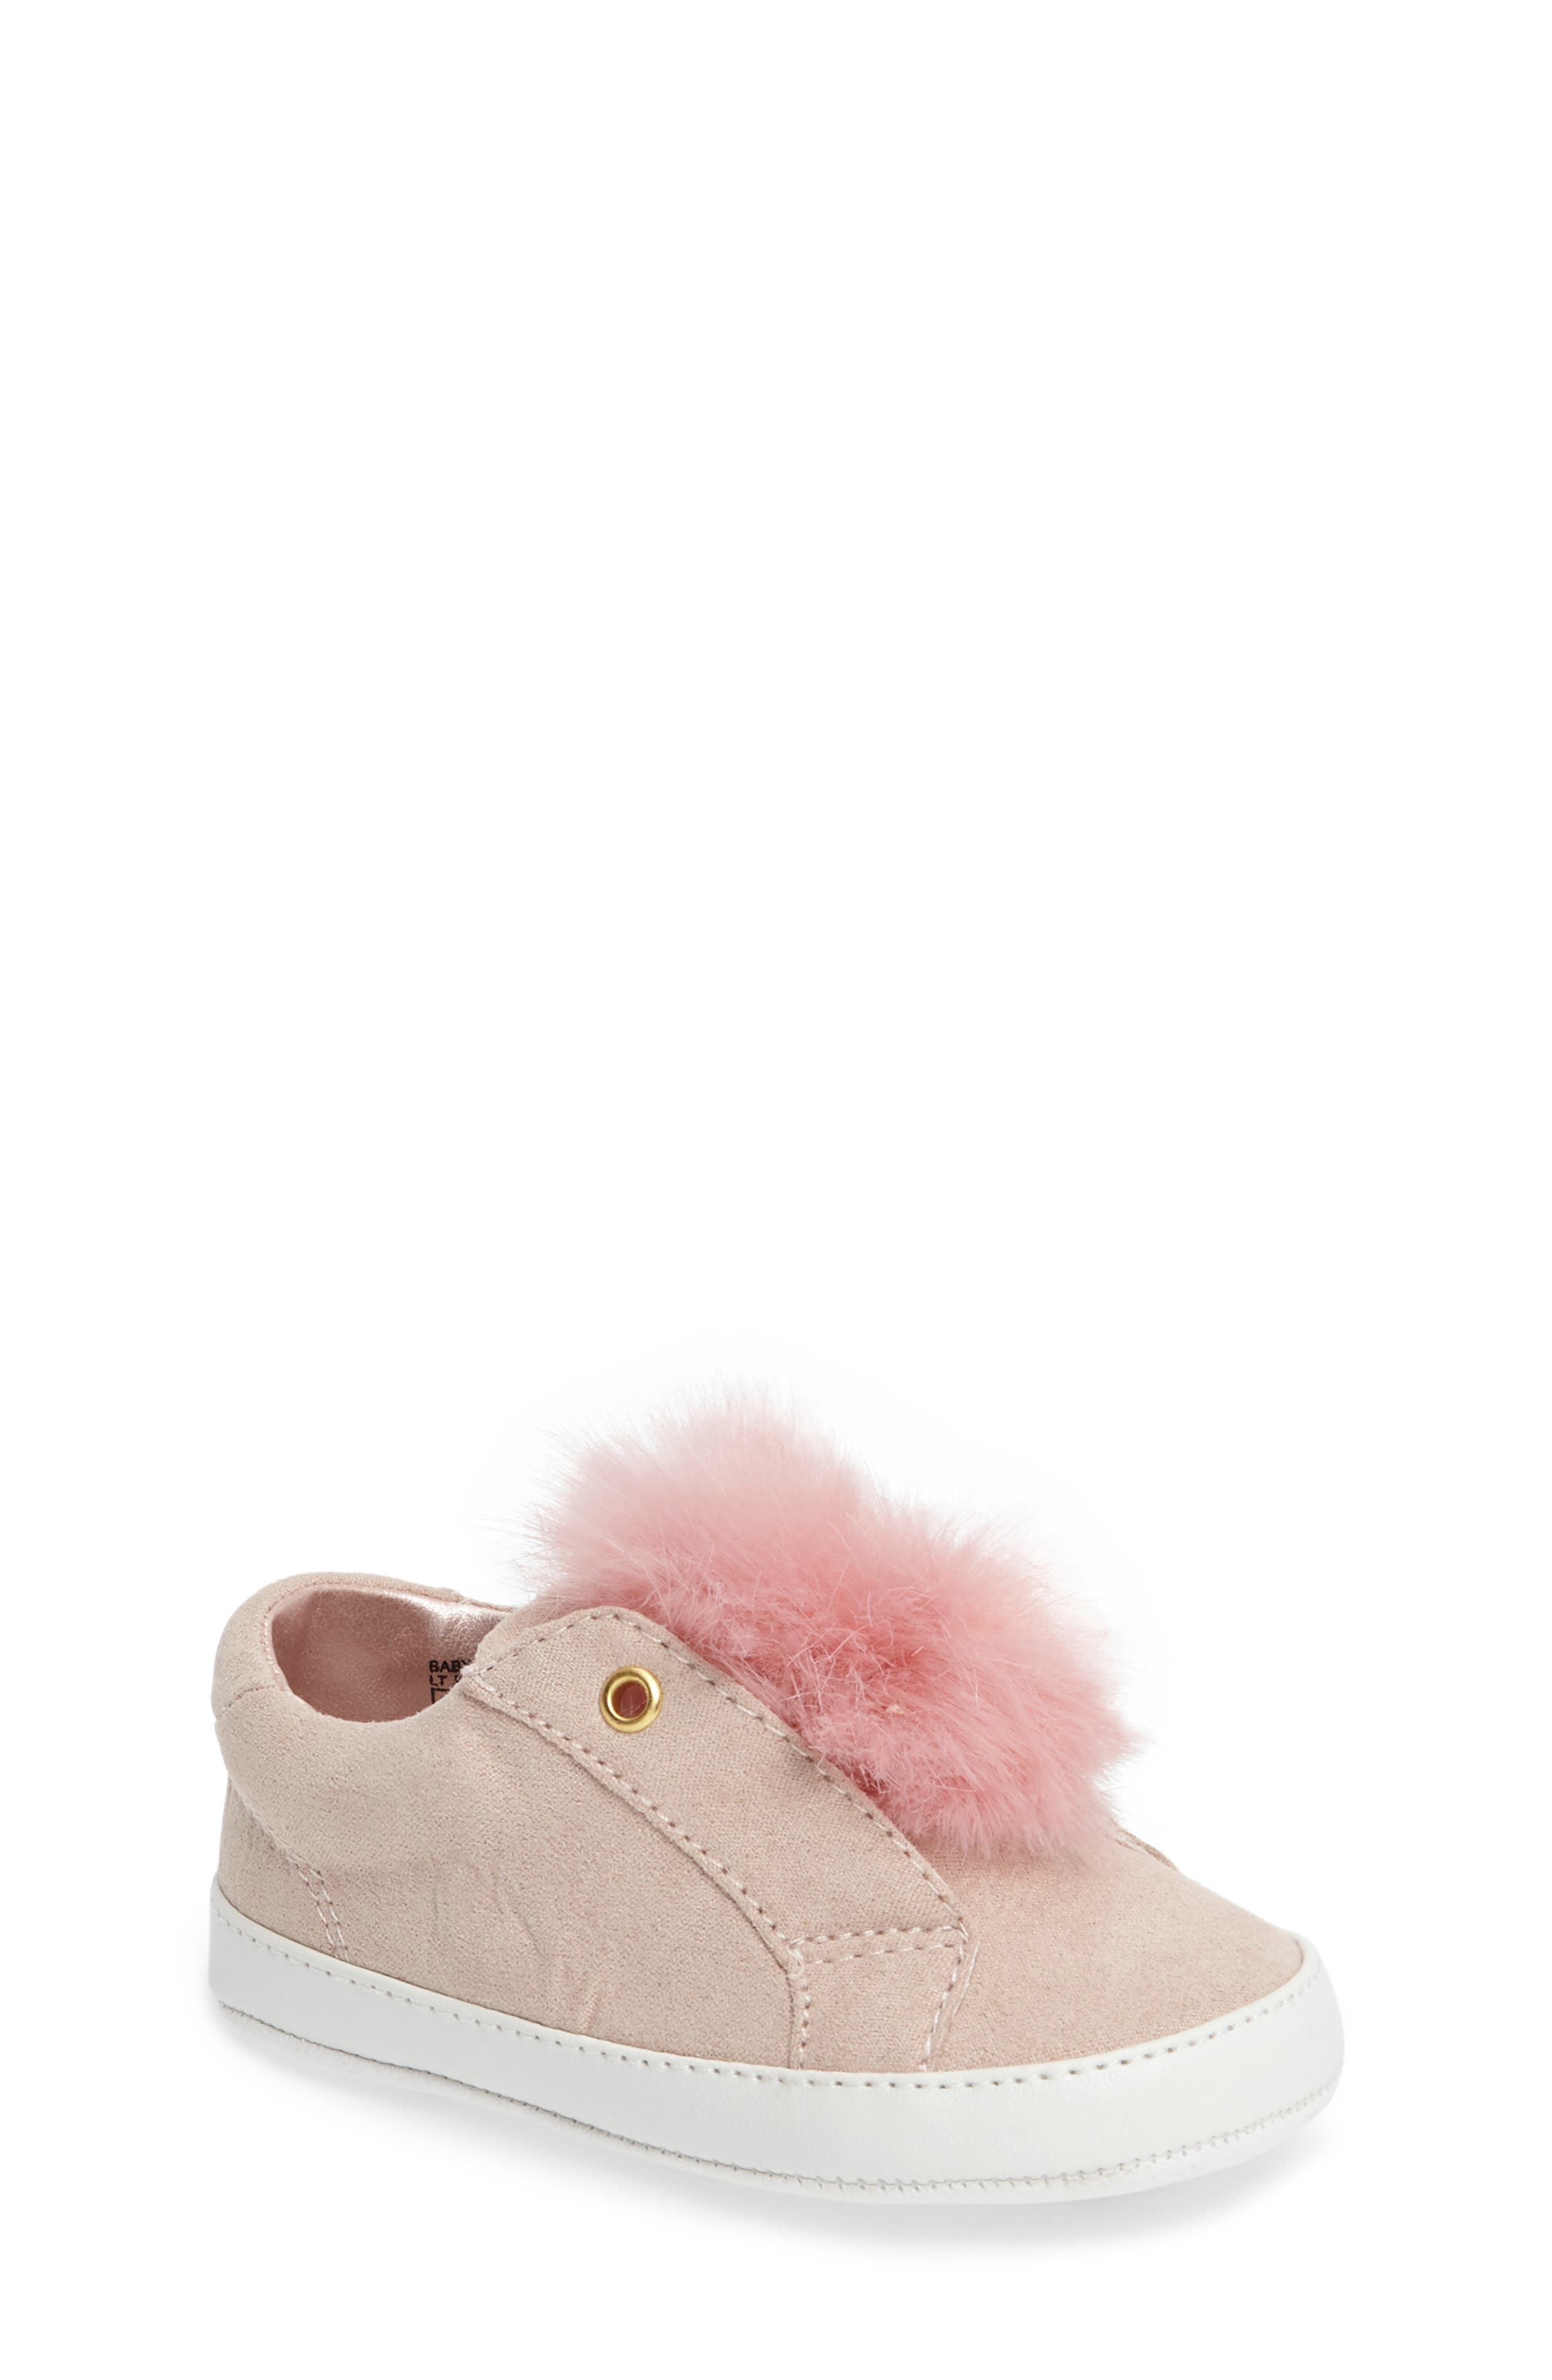 Main Image - Sam Edelman Leya Faux Fur Pompom Sneaker (Baby)